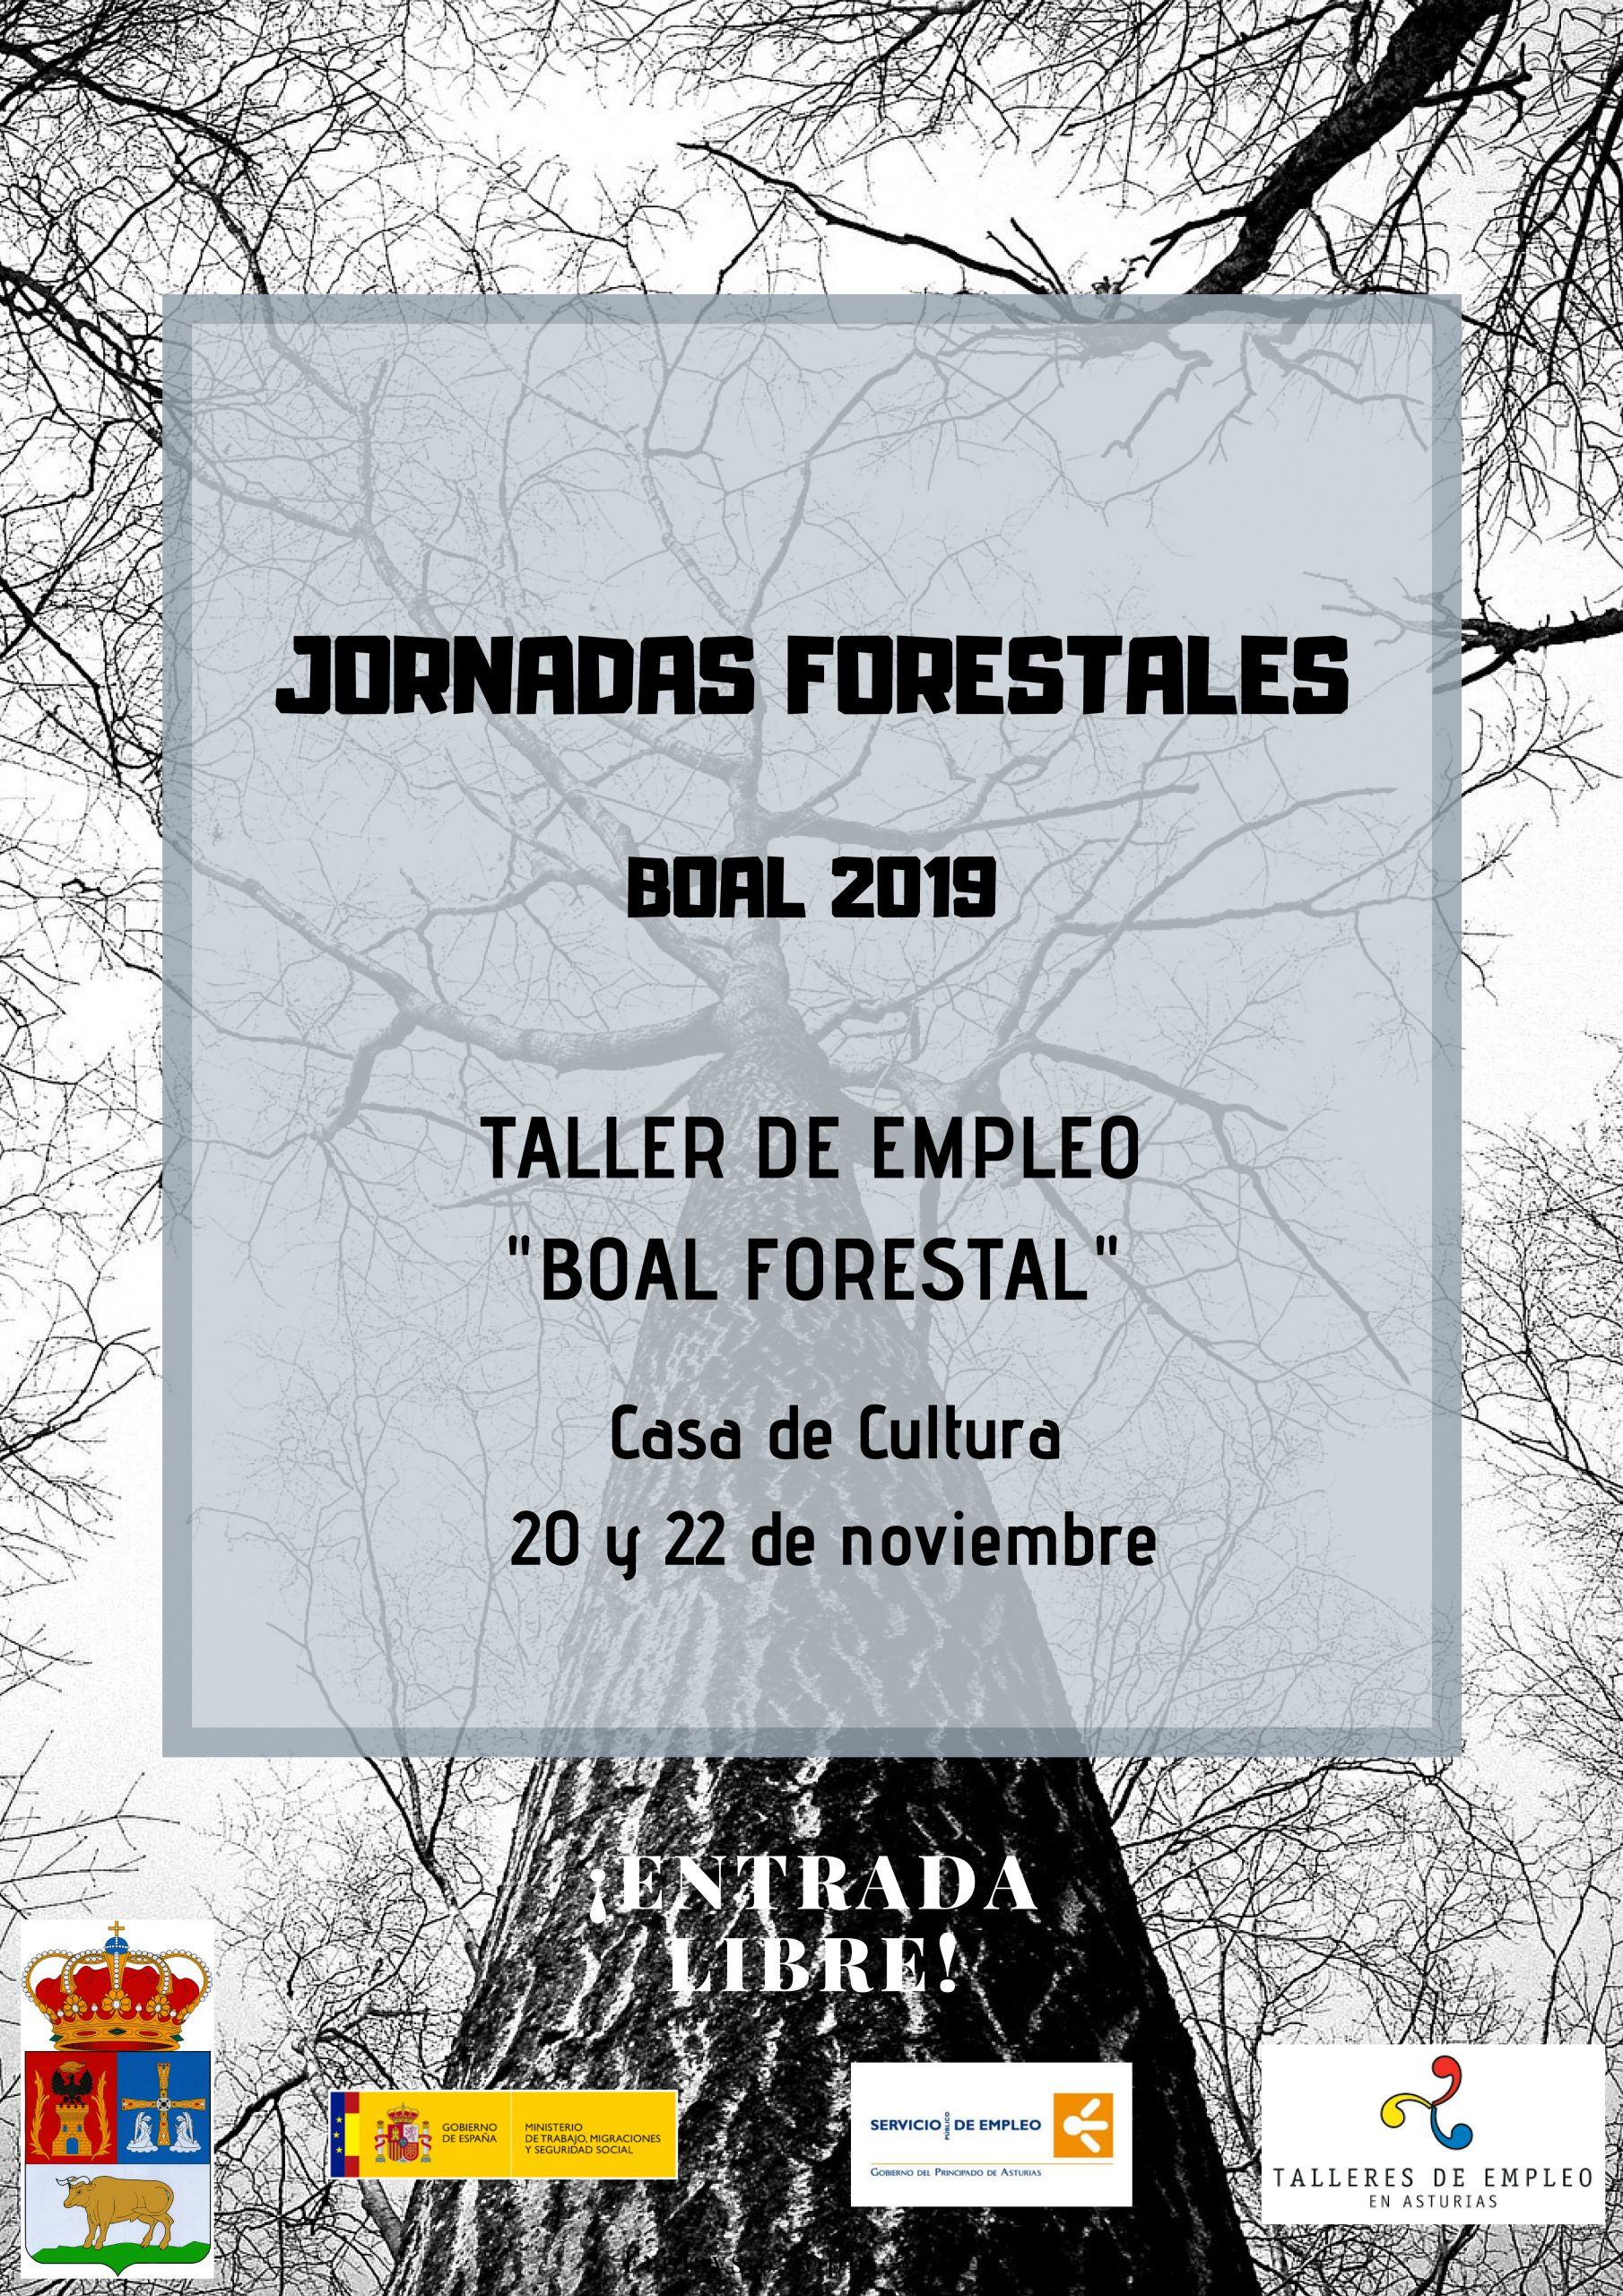 Jornadas Forestales Boal 2019